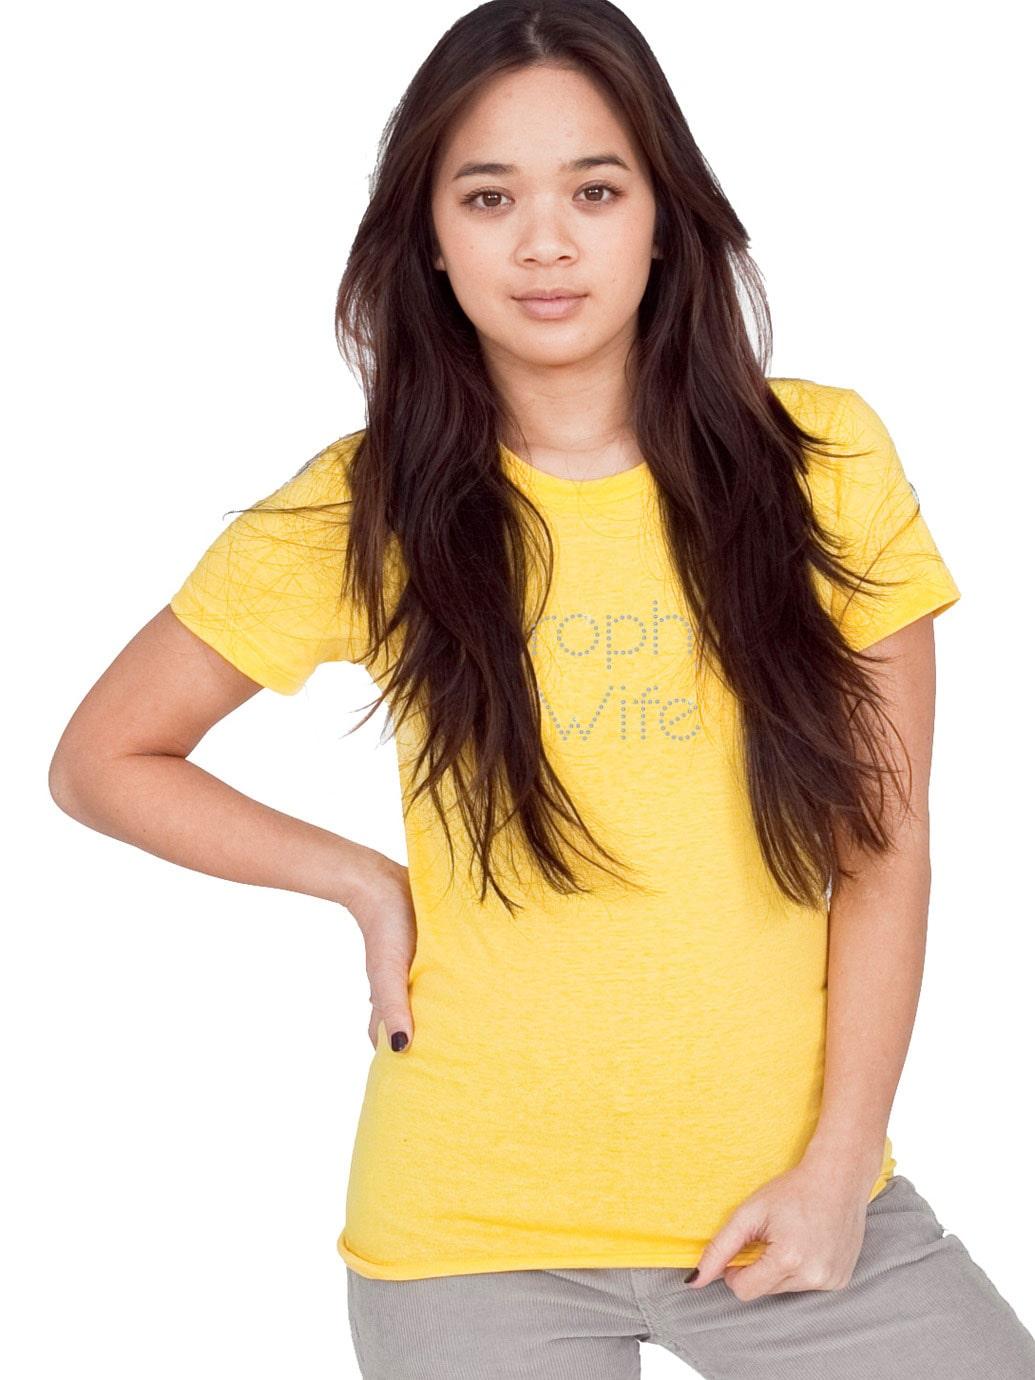 Trophy Wife Bling T Shirt Tanktops No Minimum Rhinestone